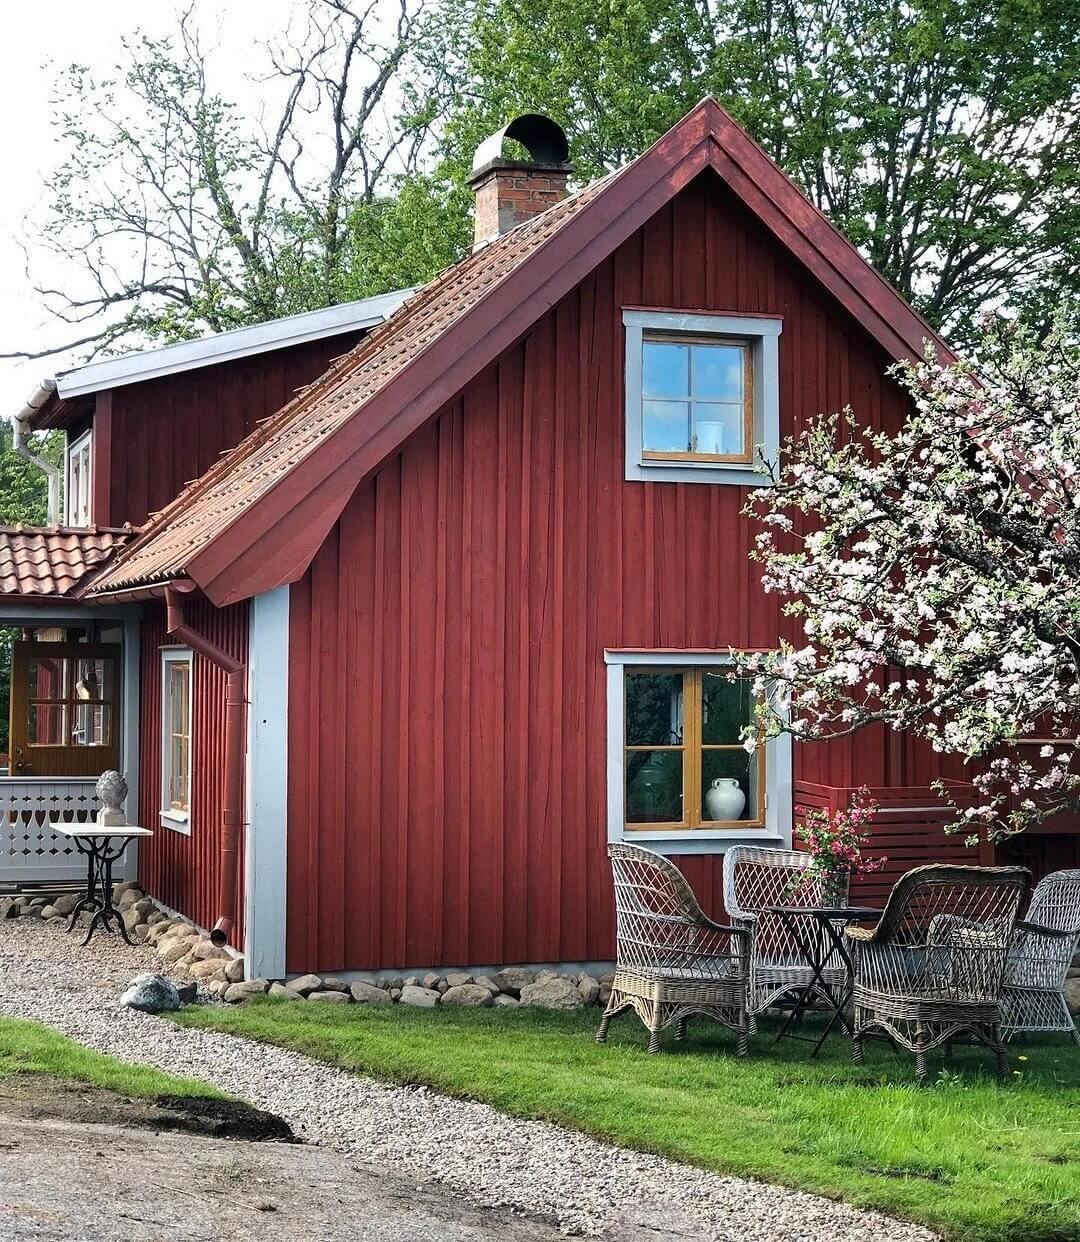 4. Scandinavian